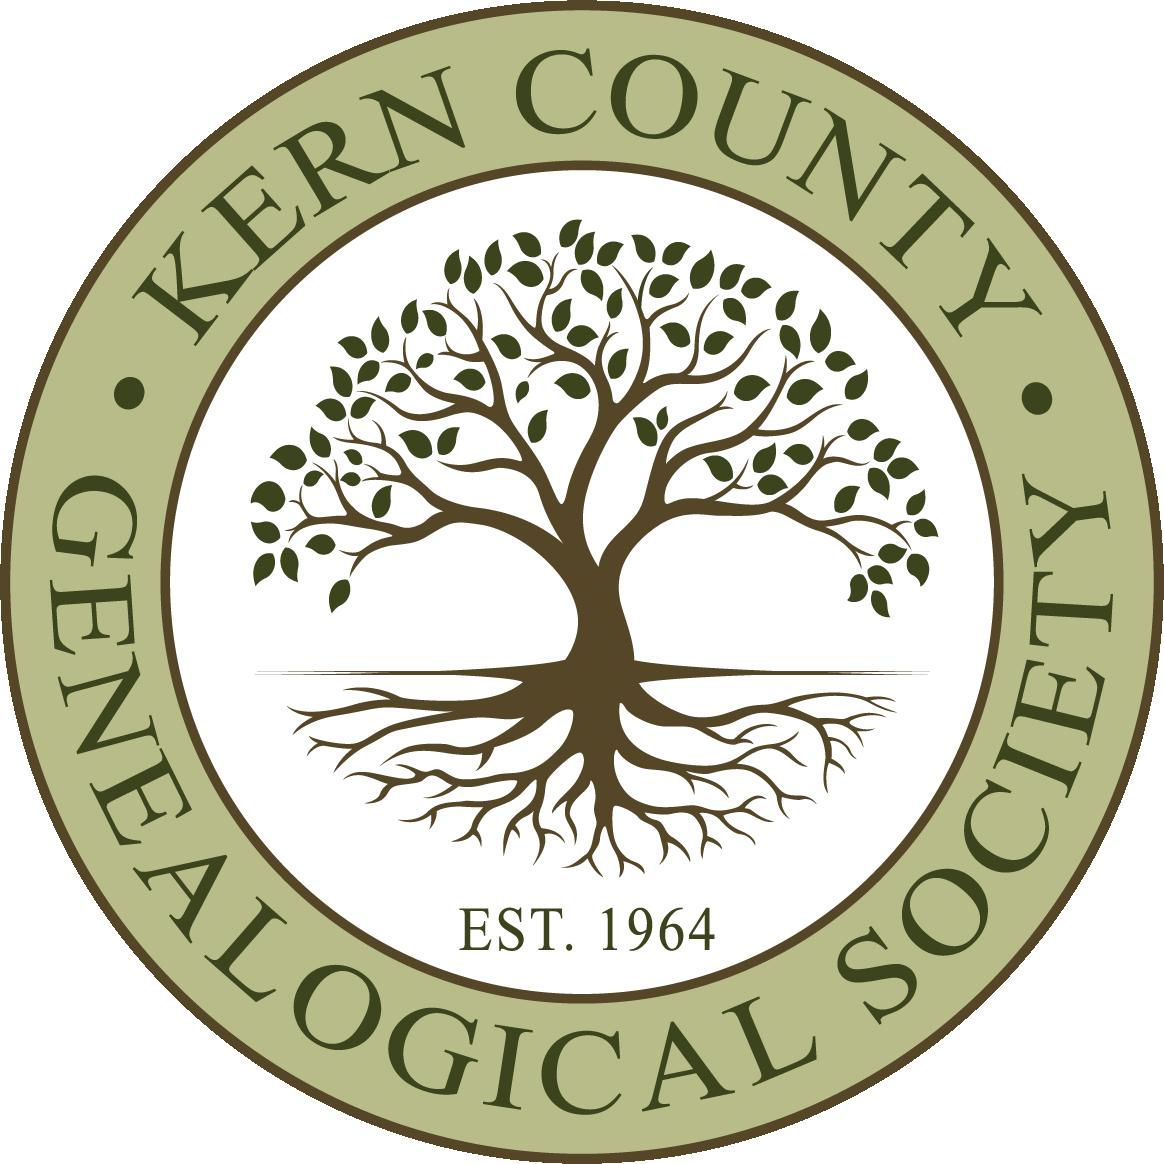 KCGS Logo 2-19.png